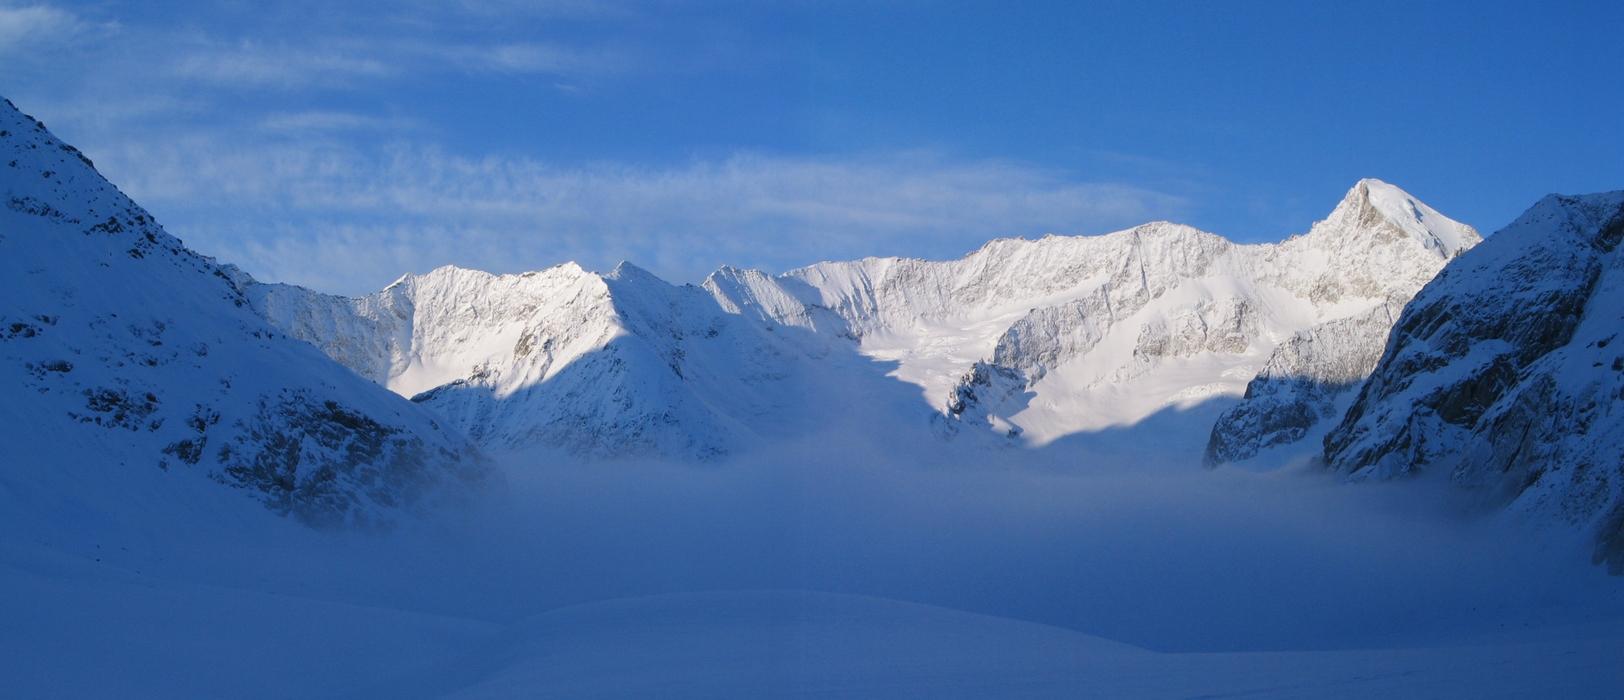 Sattelhorn Berner Alpen / Alpes bernoises Switzerland panorama 06